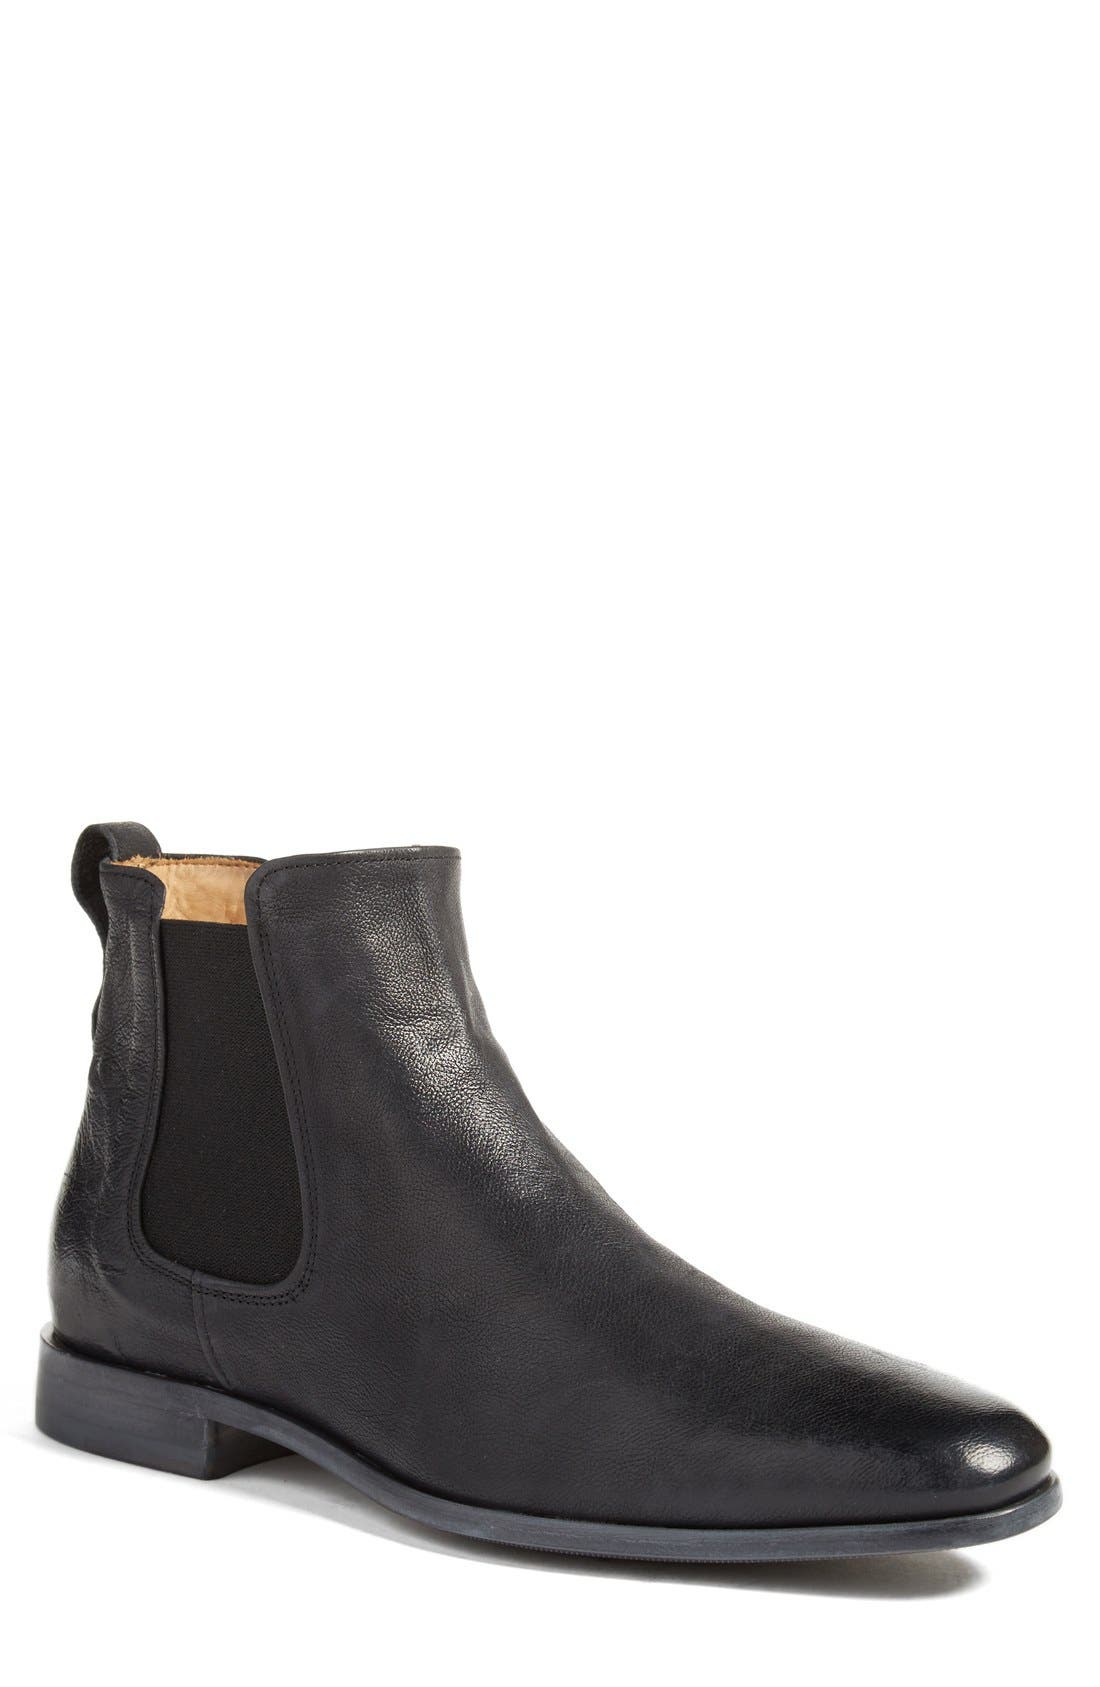 Arthur Chelsea Boot,                             Main thumbnail 1, color,                             Black Leather